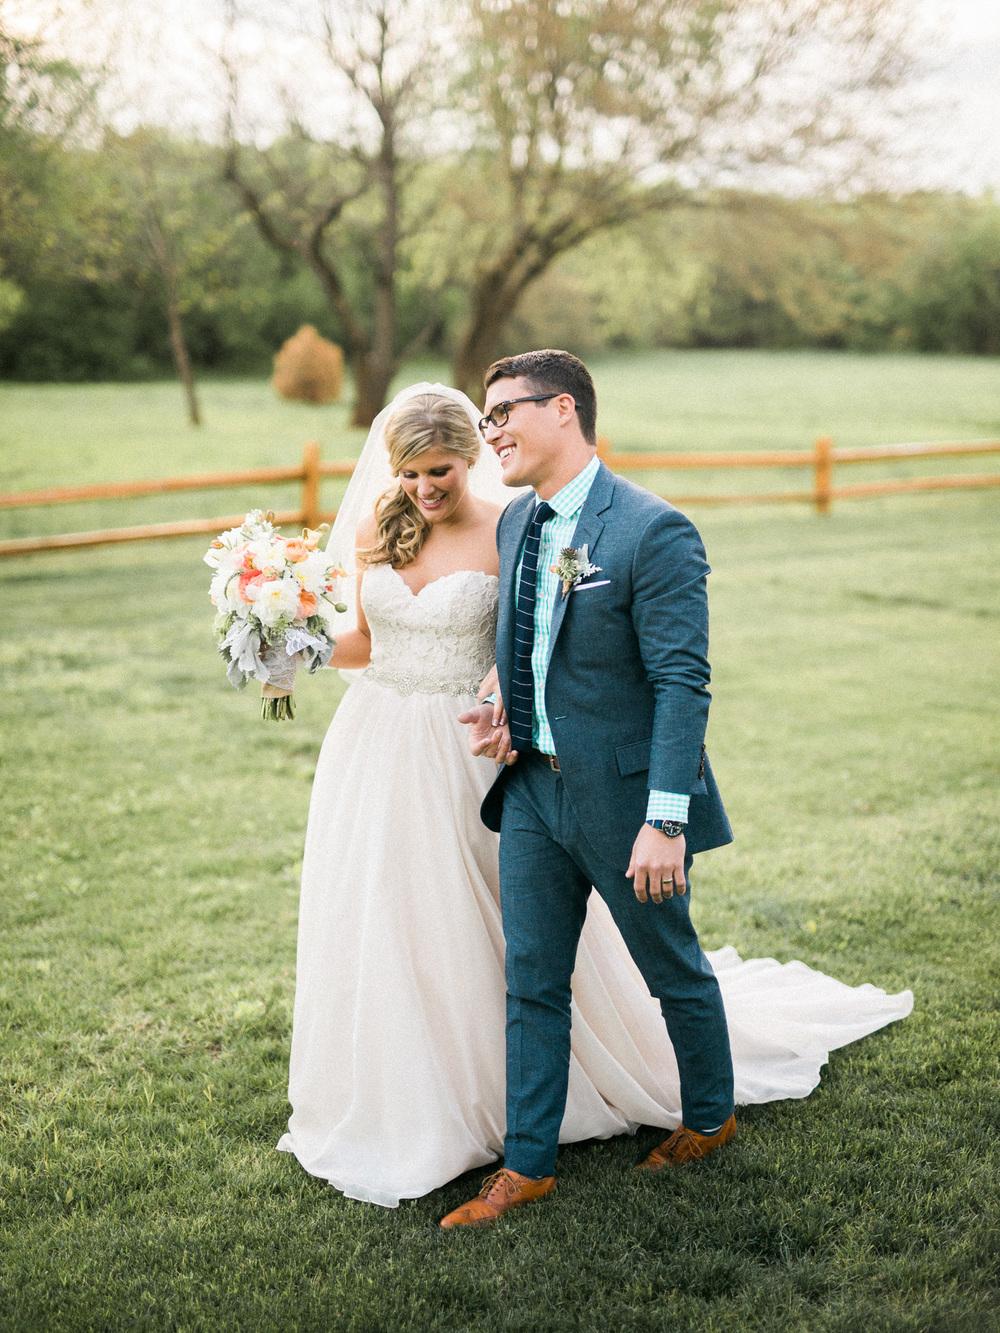 Chisolm_Springs_Wedding_OKC_Film_photographer-16.jpg